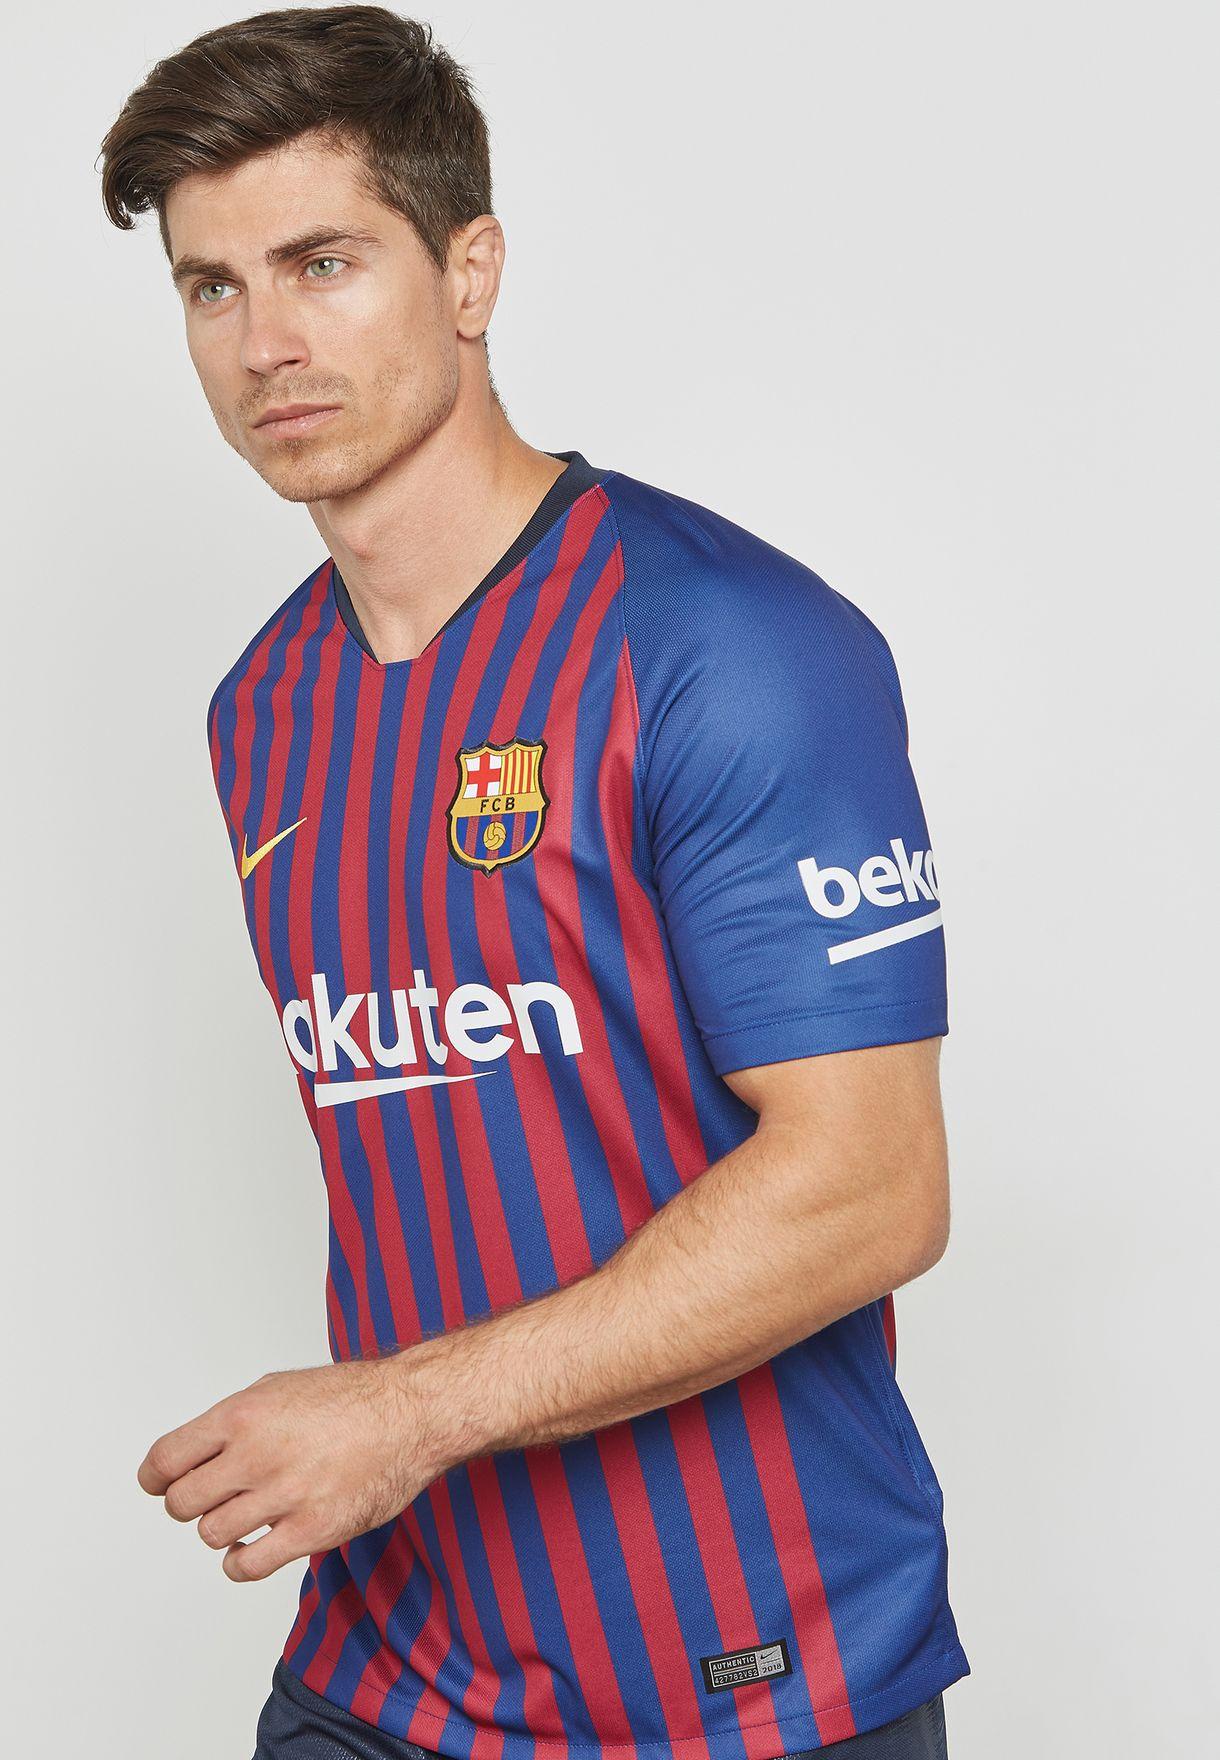 a6b1b2792c8 Shop Nike blue FC Barcelona 18/19 Stadium Home Jersey 894430-456 for ...